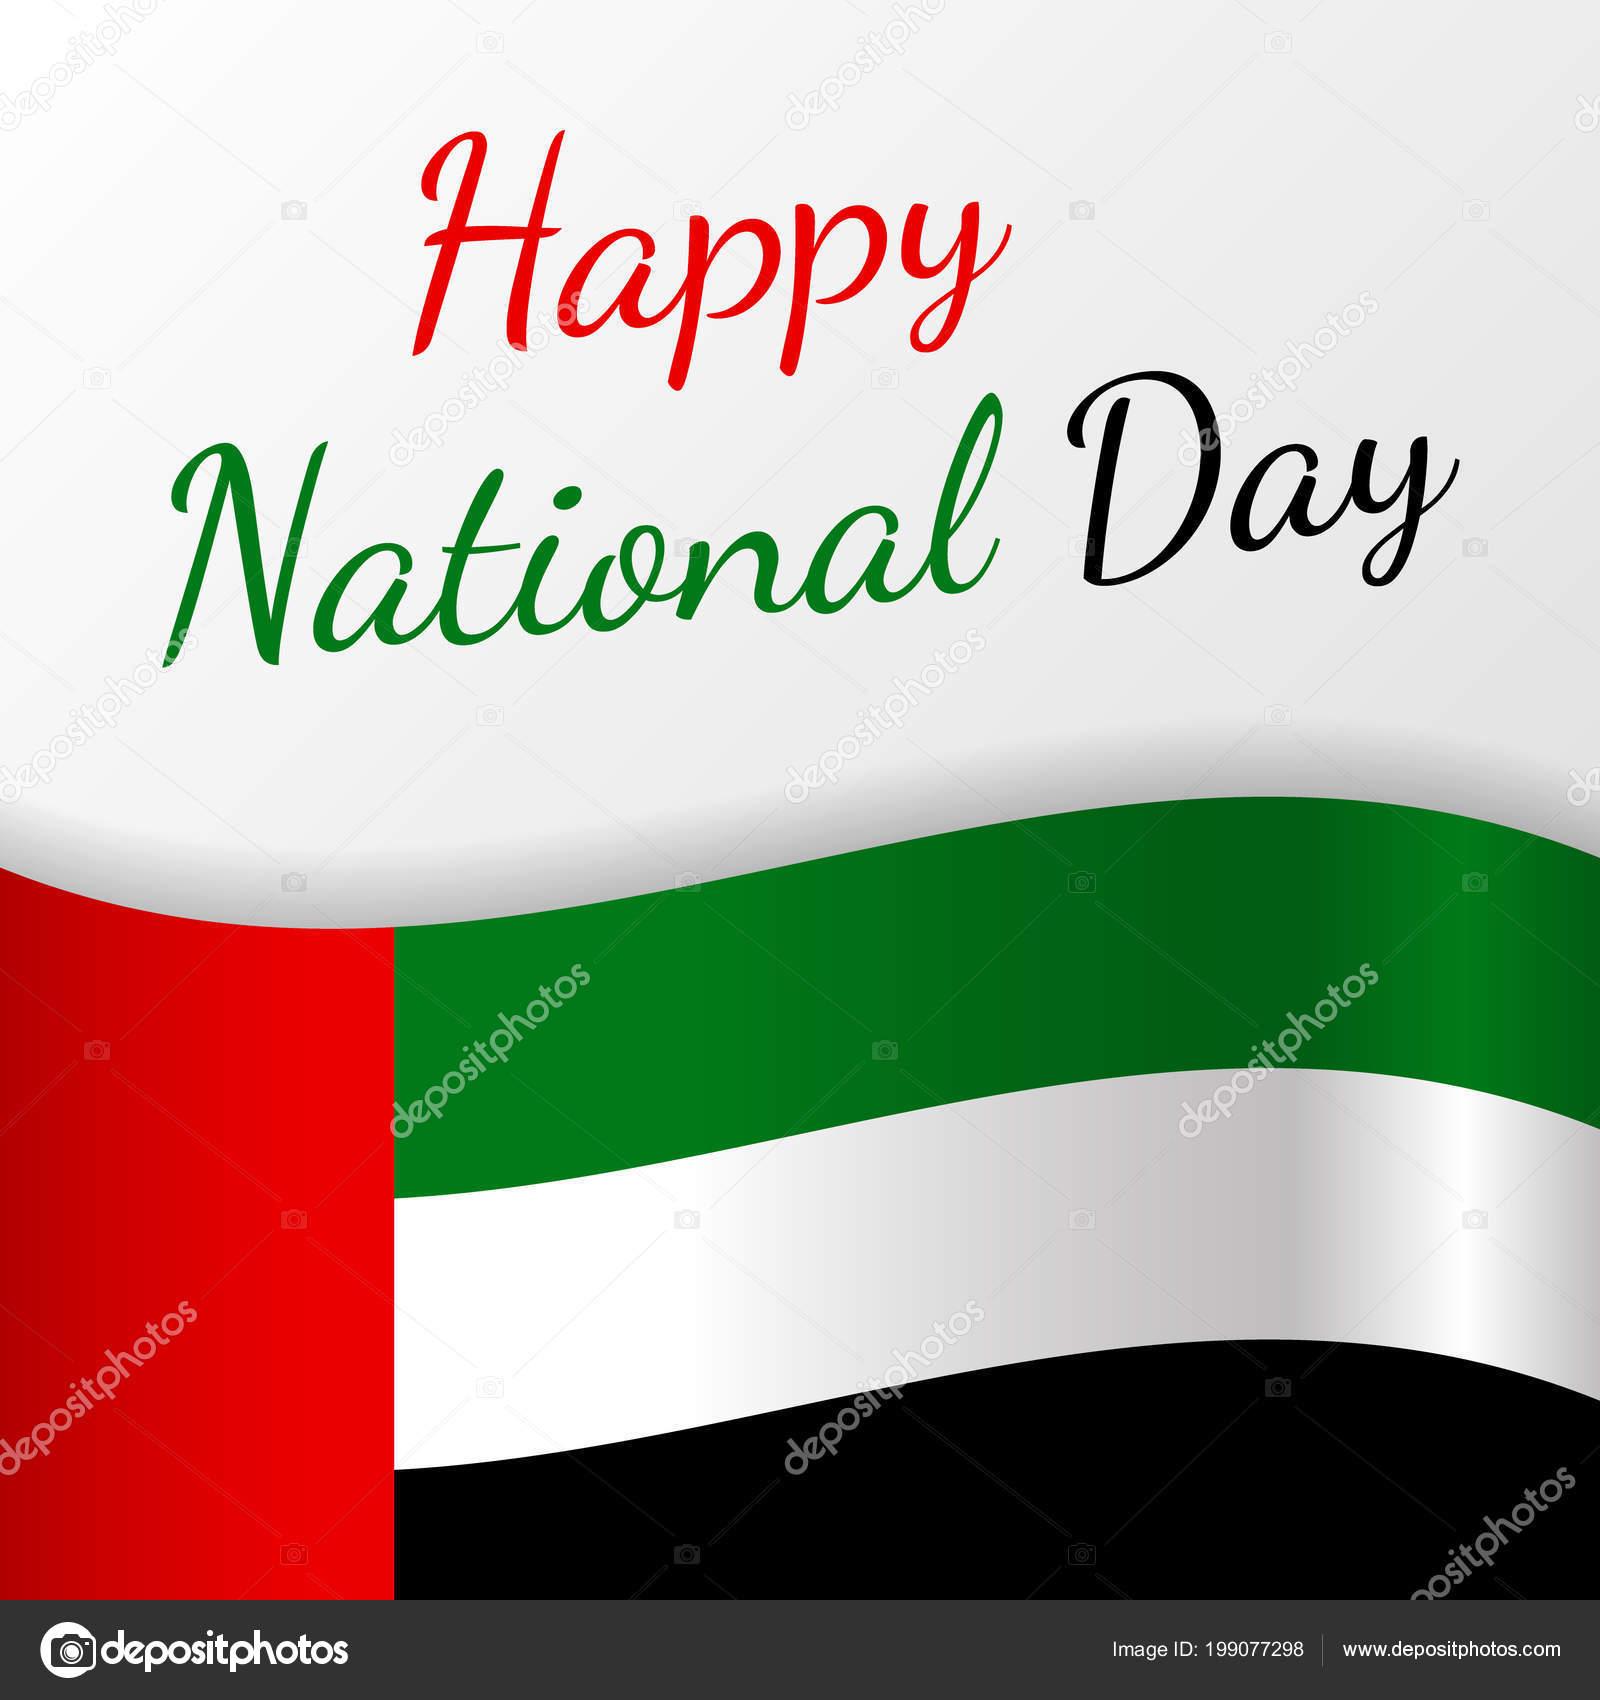 Happy national day united arab emirates card greeting vector stock happy national day united arab emirates card greeting vector stock vector m4hsunfo